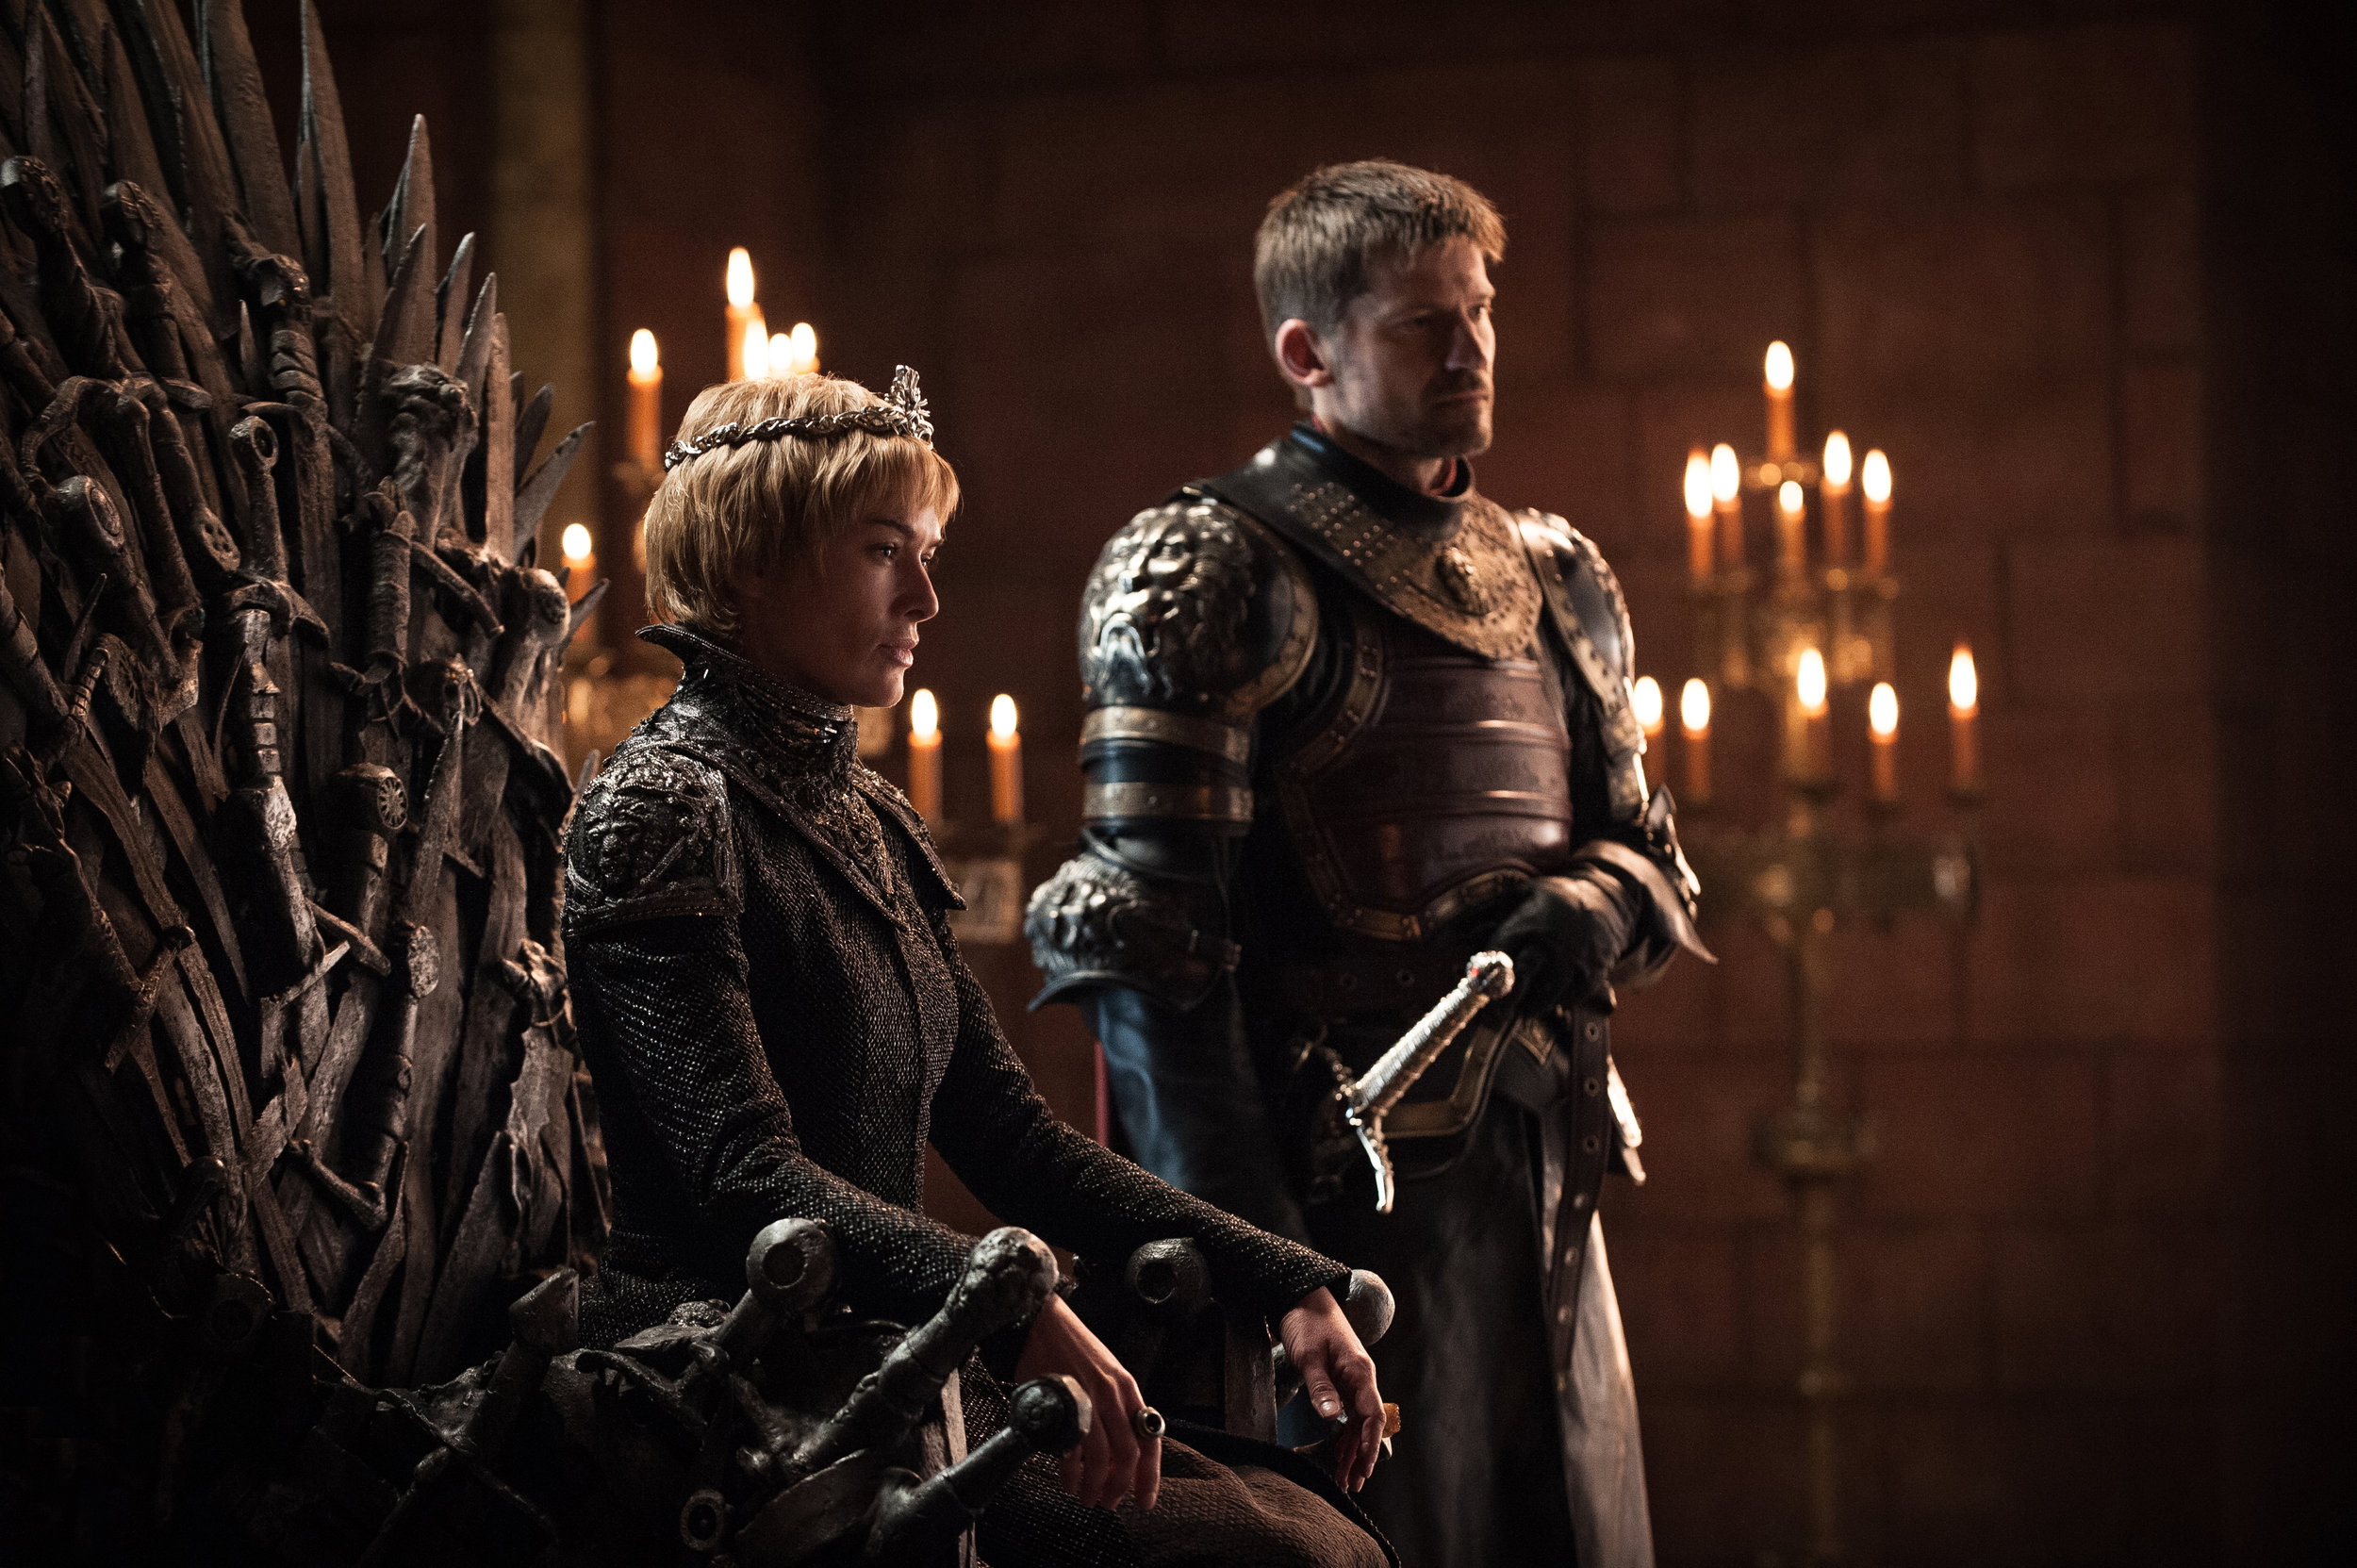 Lena Headey  as Cersei Lannister and  Nikolaj Coster-Waldau  as Jaime Lannister -  Photo: Helen Sloan/HBO